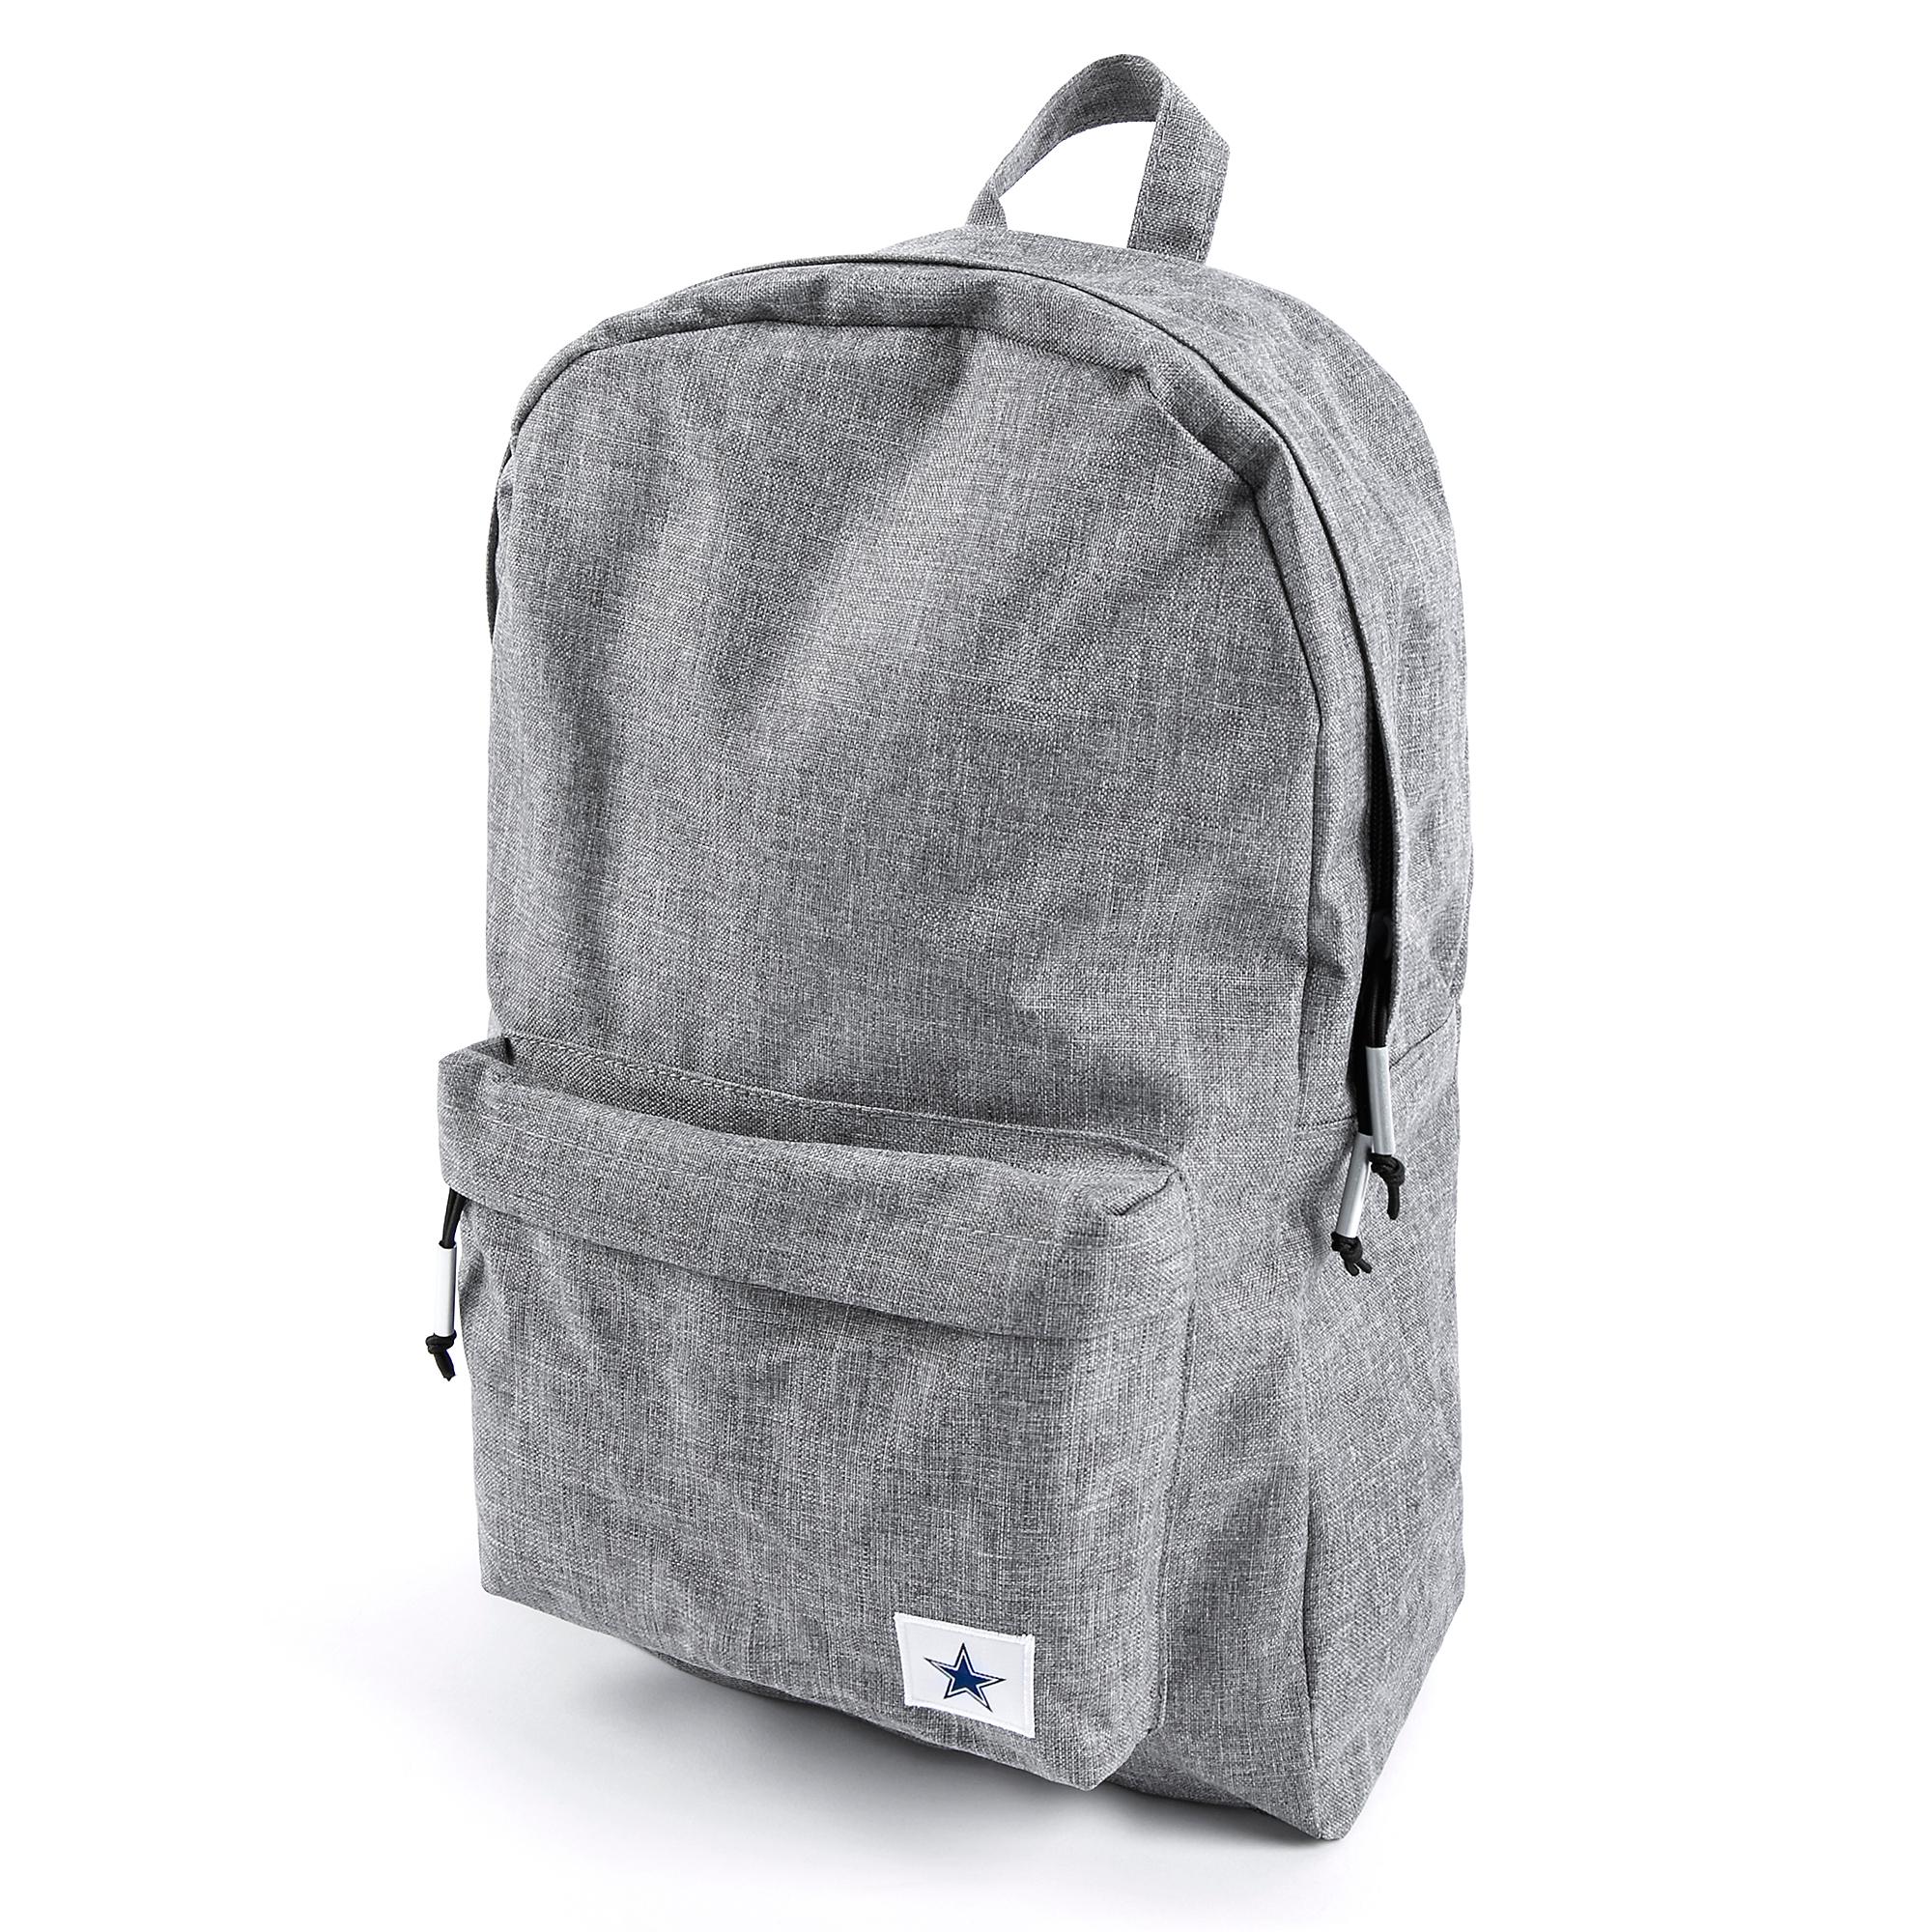 Dallas Cowboys Cruiser Backpack